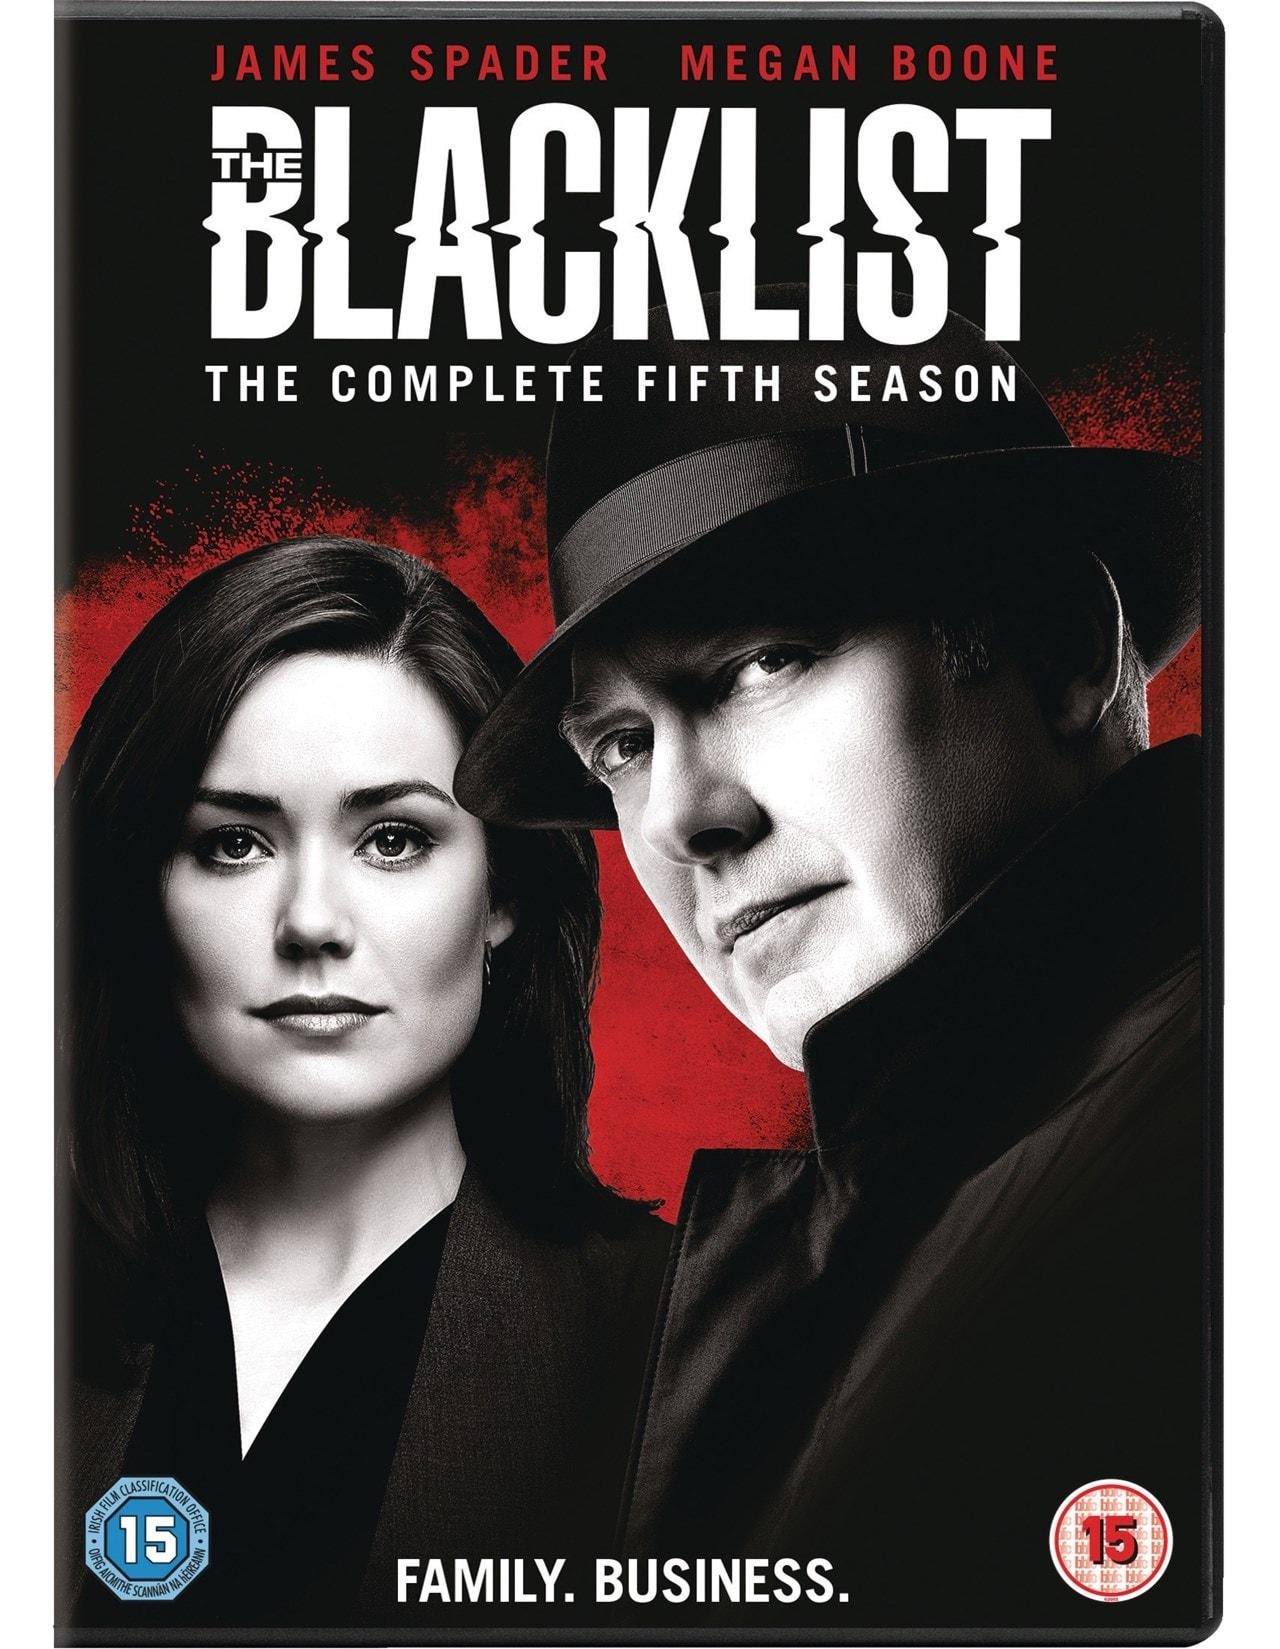 The Blacklist: The Complete Fifth Season - 1